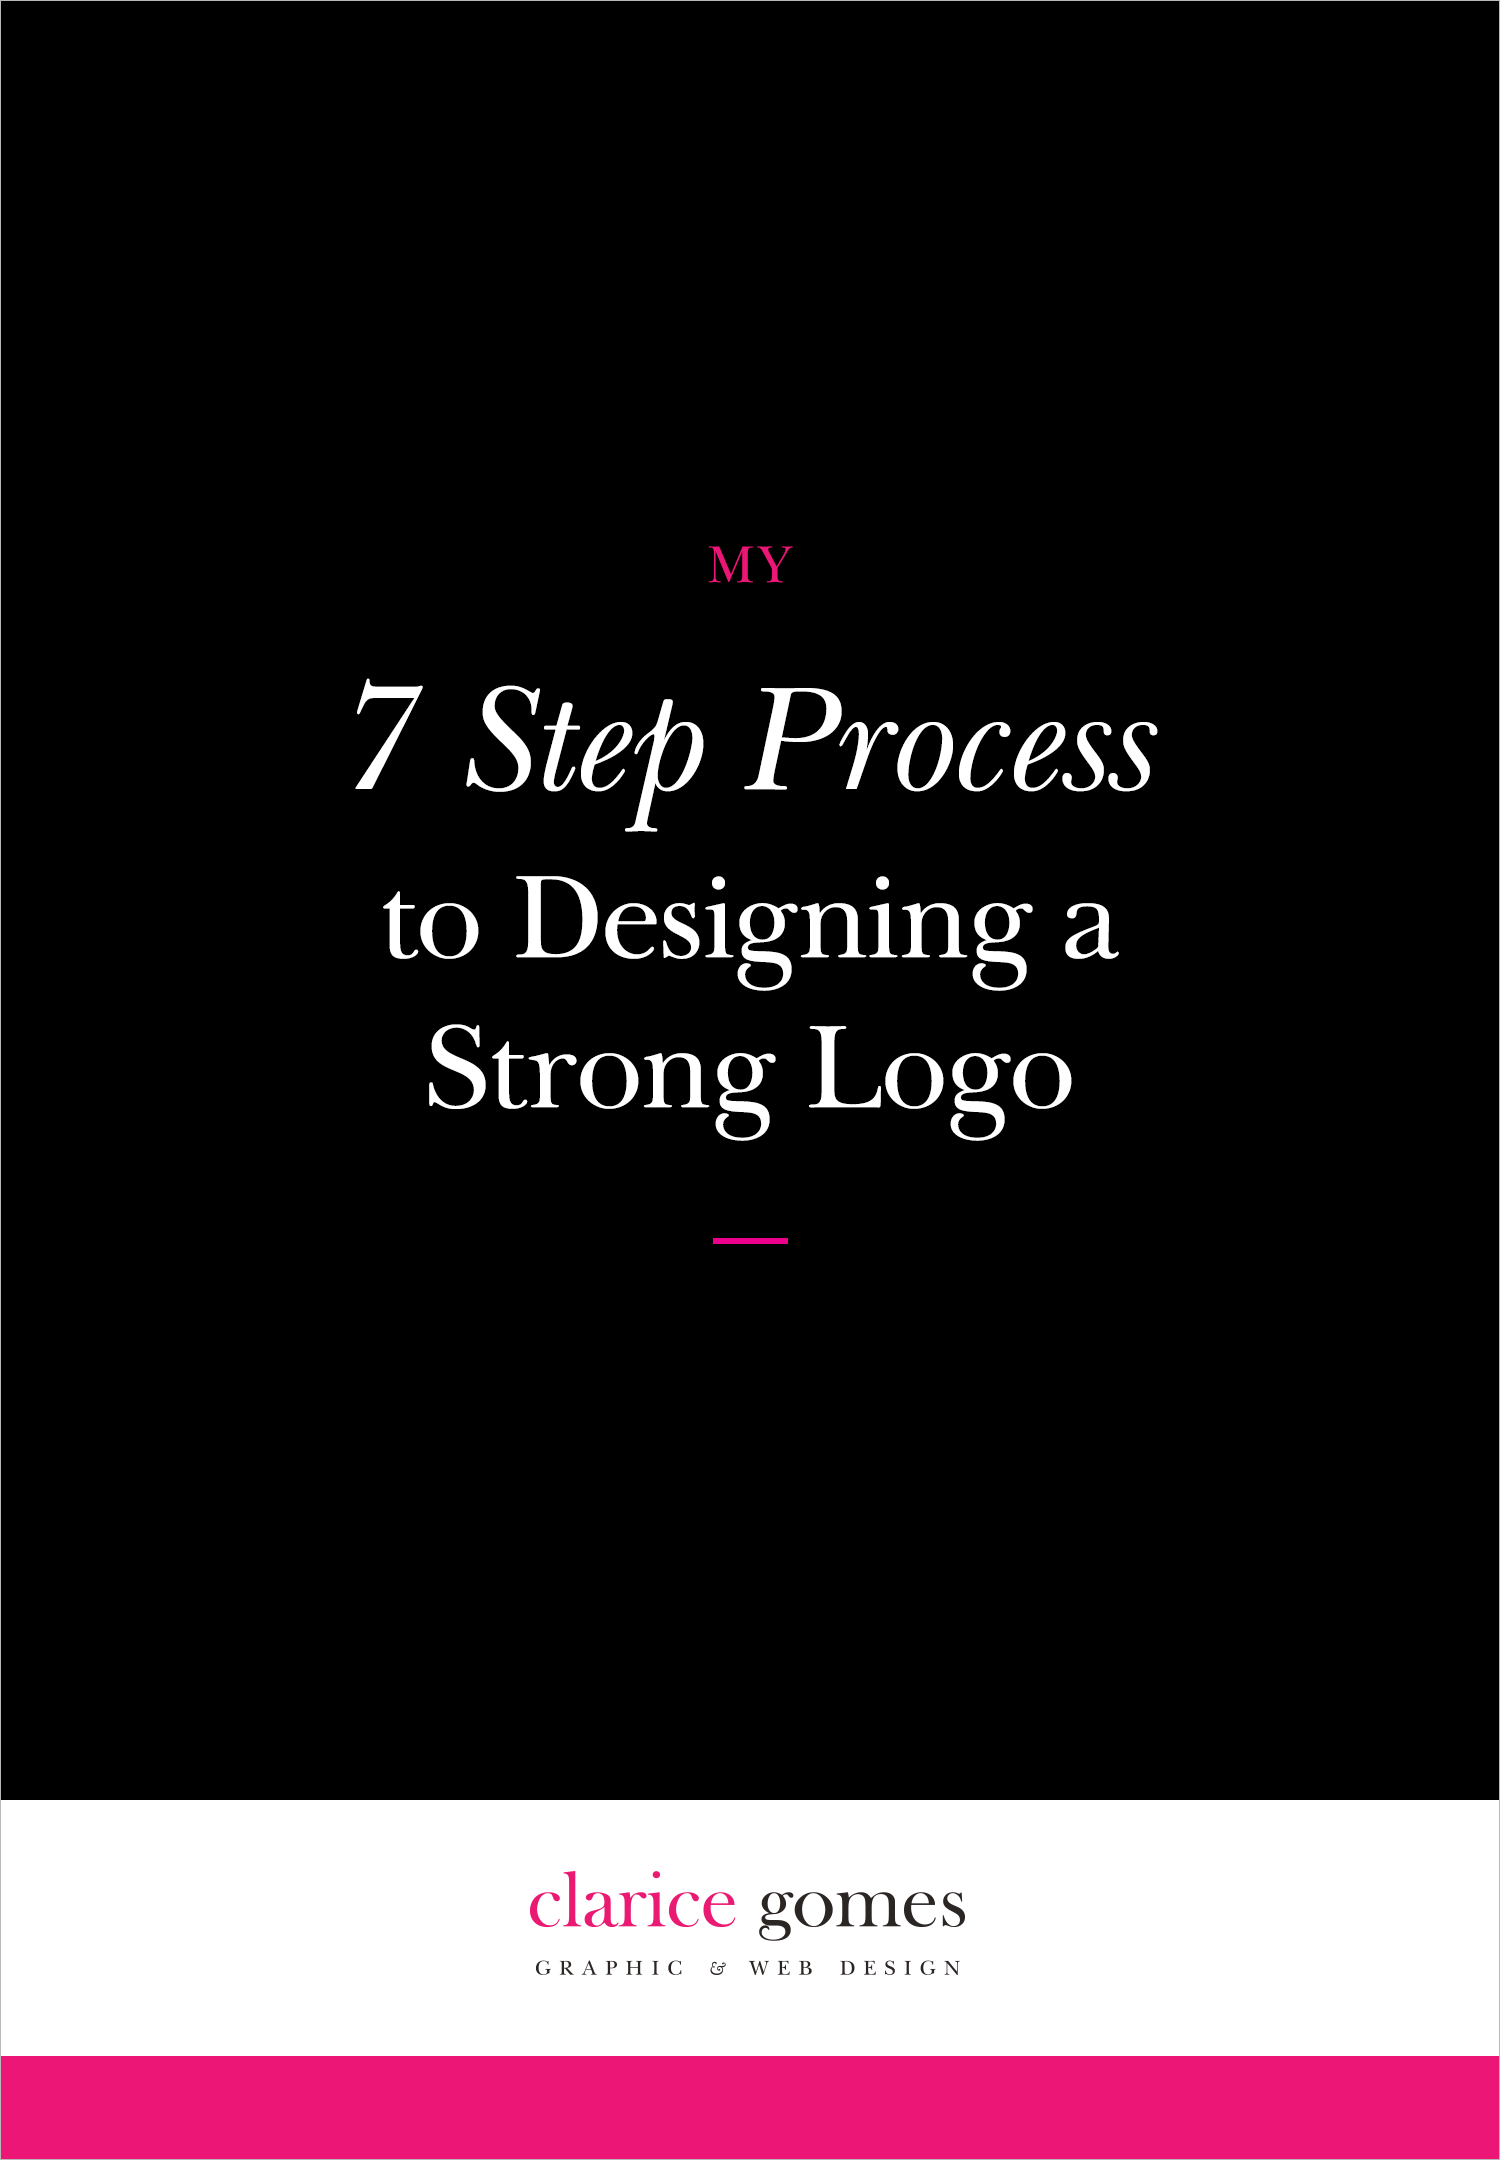 7steplogo-process-claricegomes